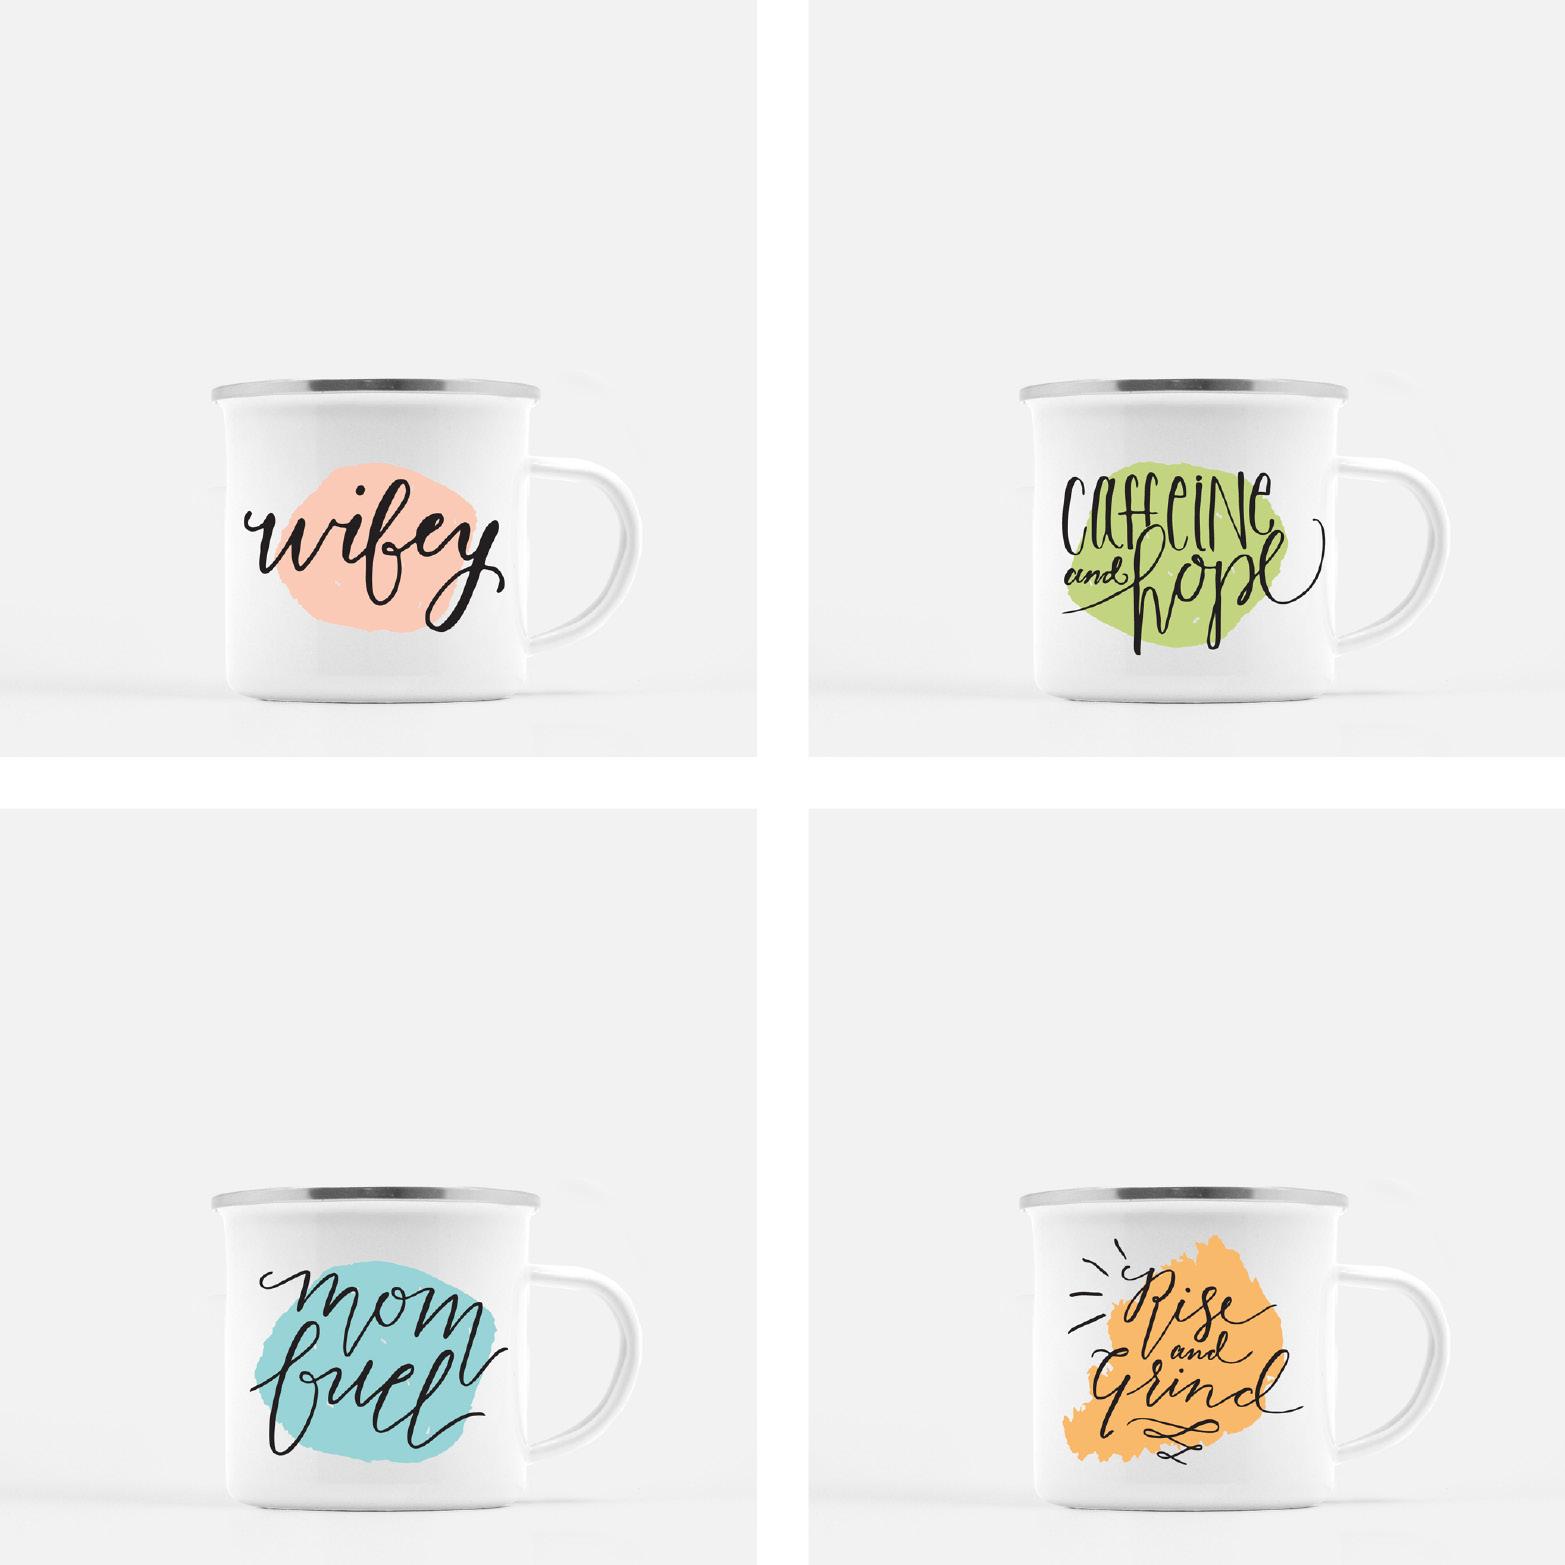 Joyful Week at Proof & Parchment no. 8: Coffee Mugs